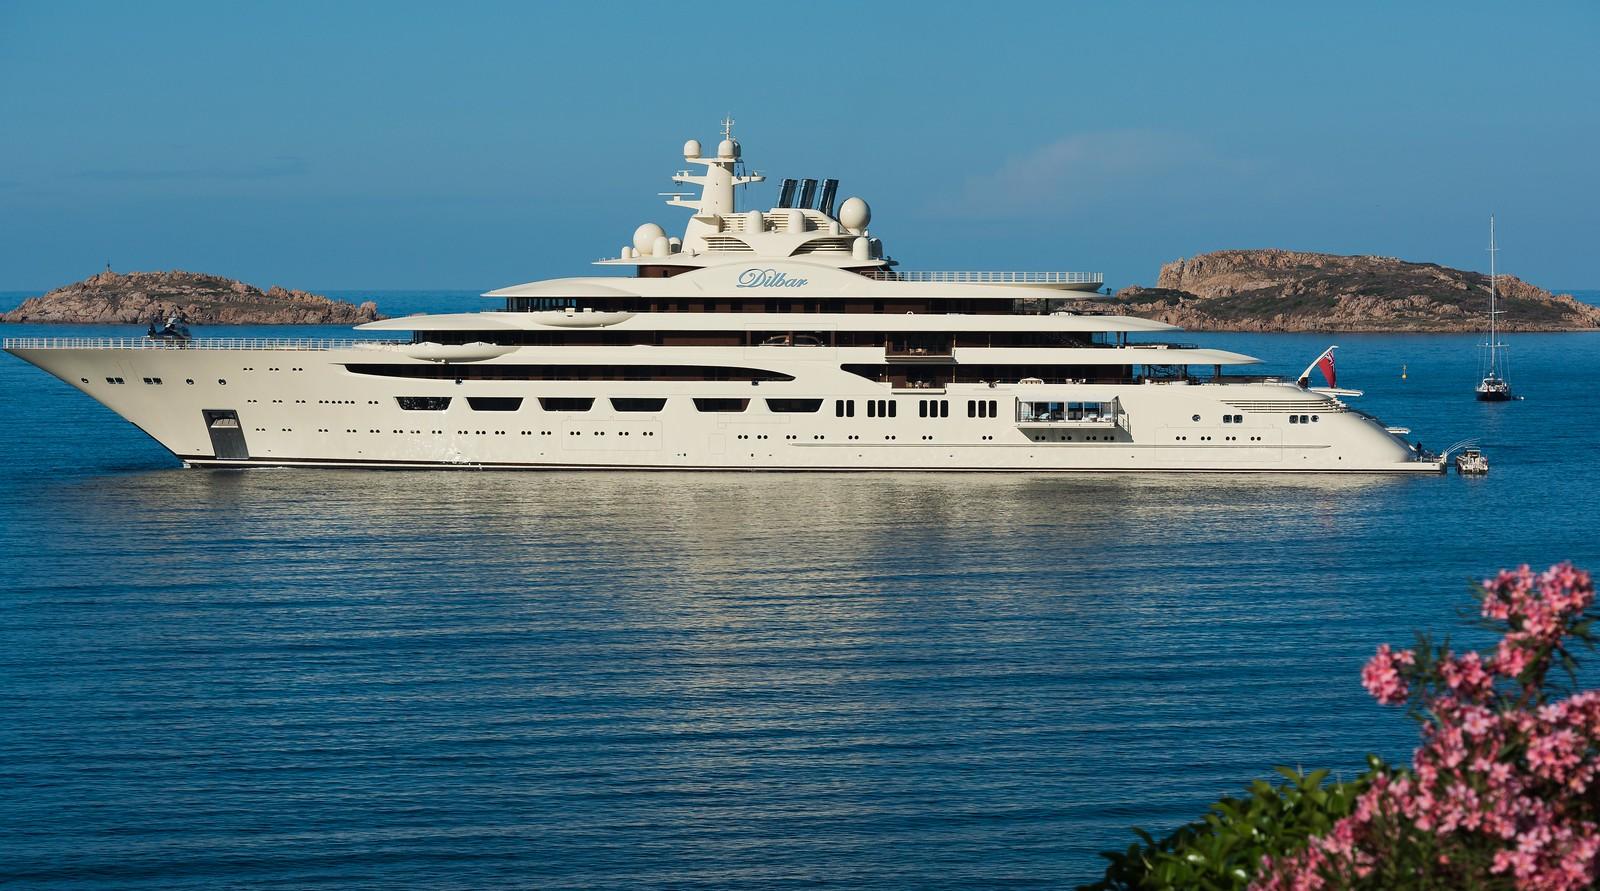 Yacht Dilbar 2156m di lunghezza 23 di larghezza e alto 30